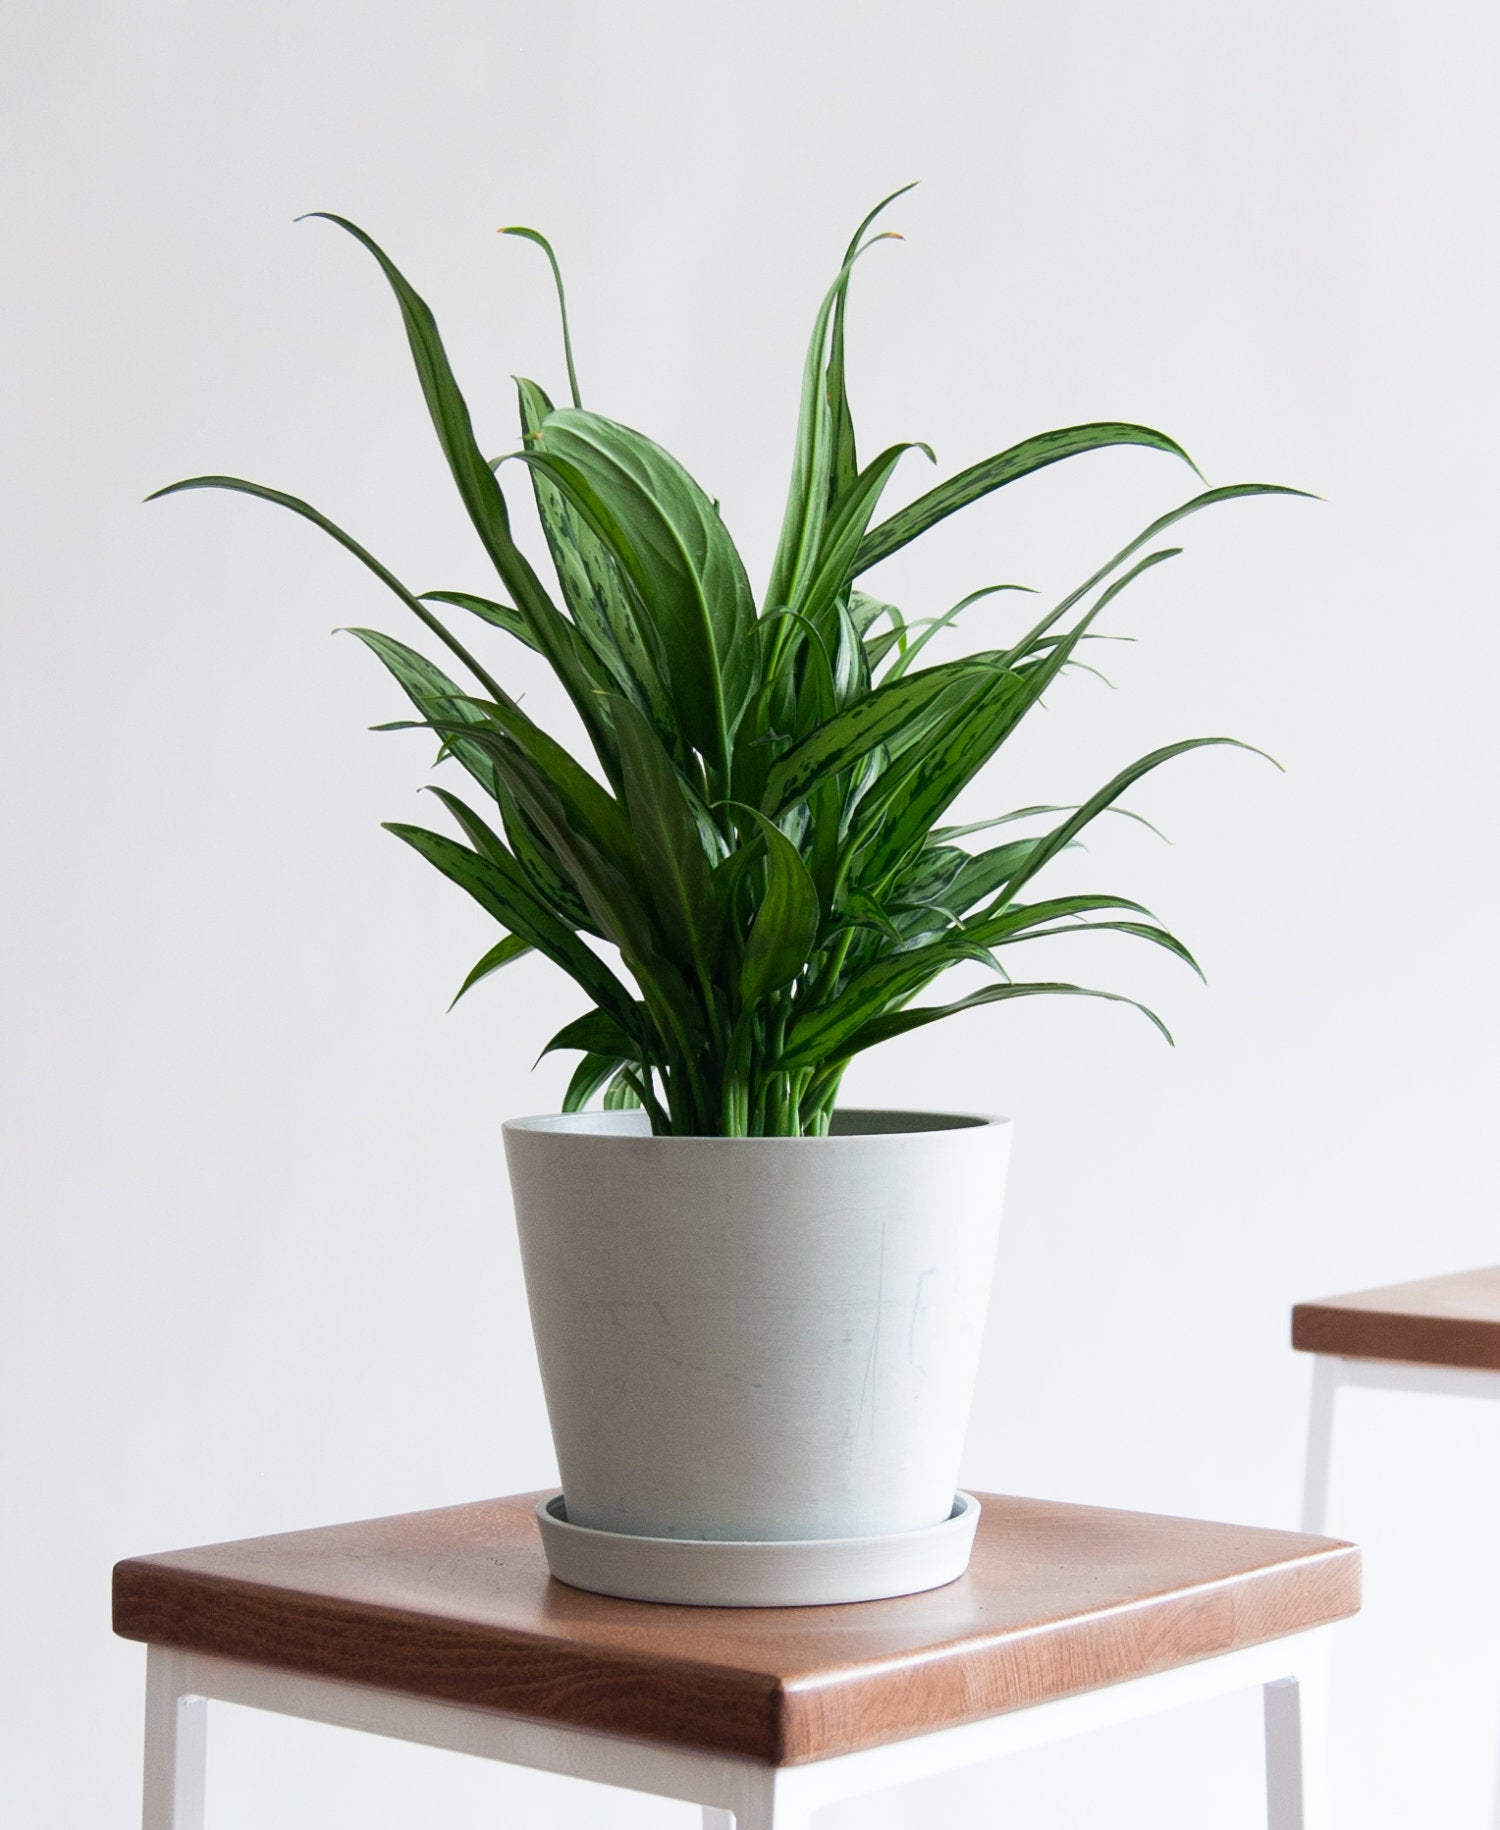 bloomscape_product-cutlass-aglaonema-stone-1-1500×1830